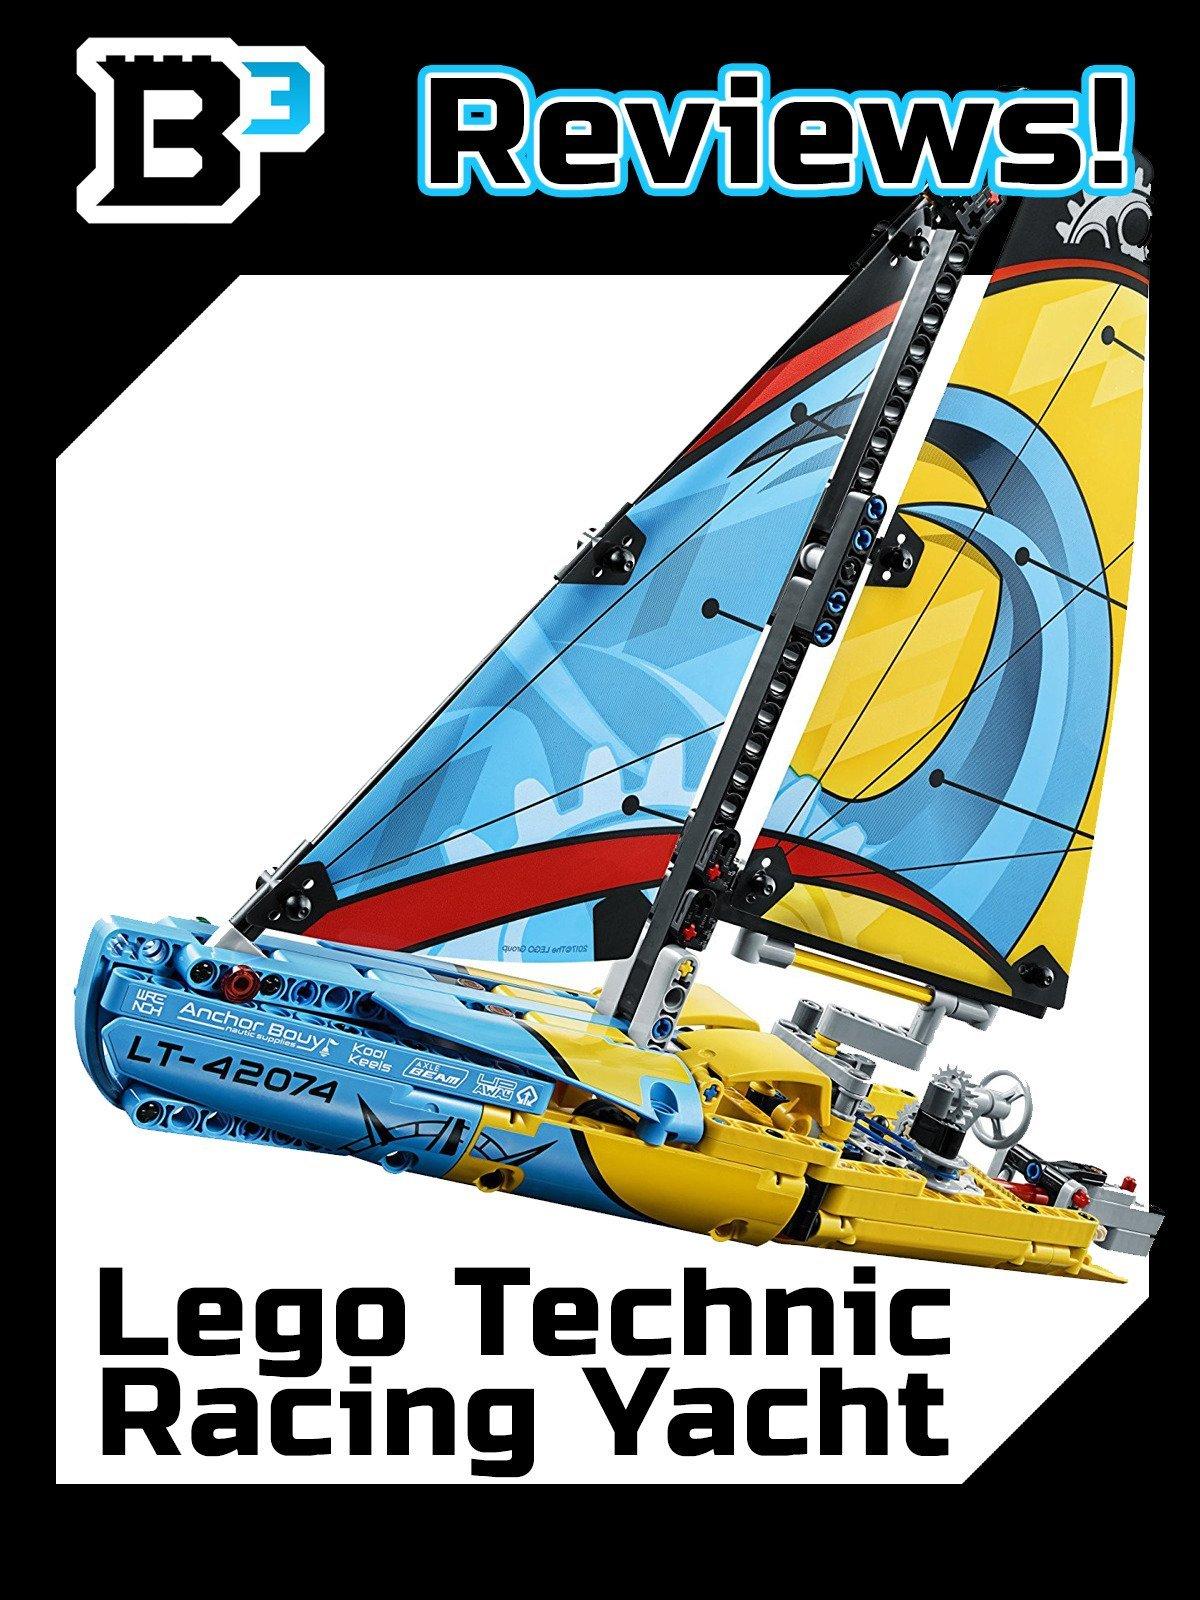 B3 Reviews! Lego Technic Racing Yacht